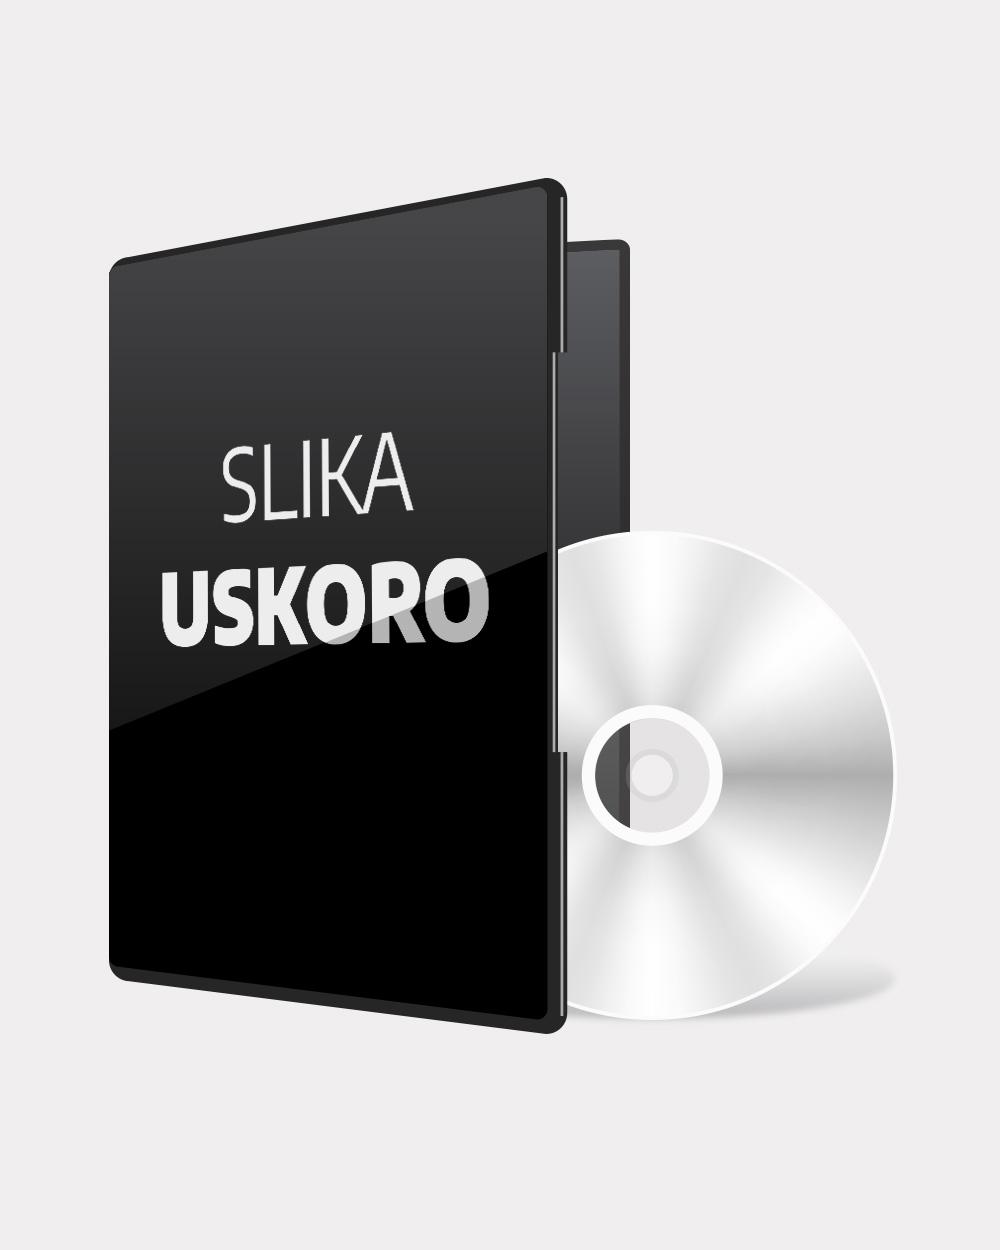 PS4 Kingdom Hearts 1.5/2.5 Compilation